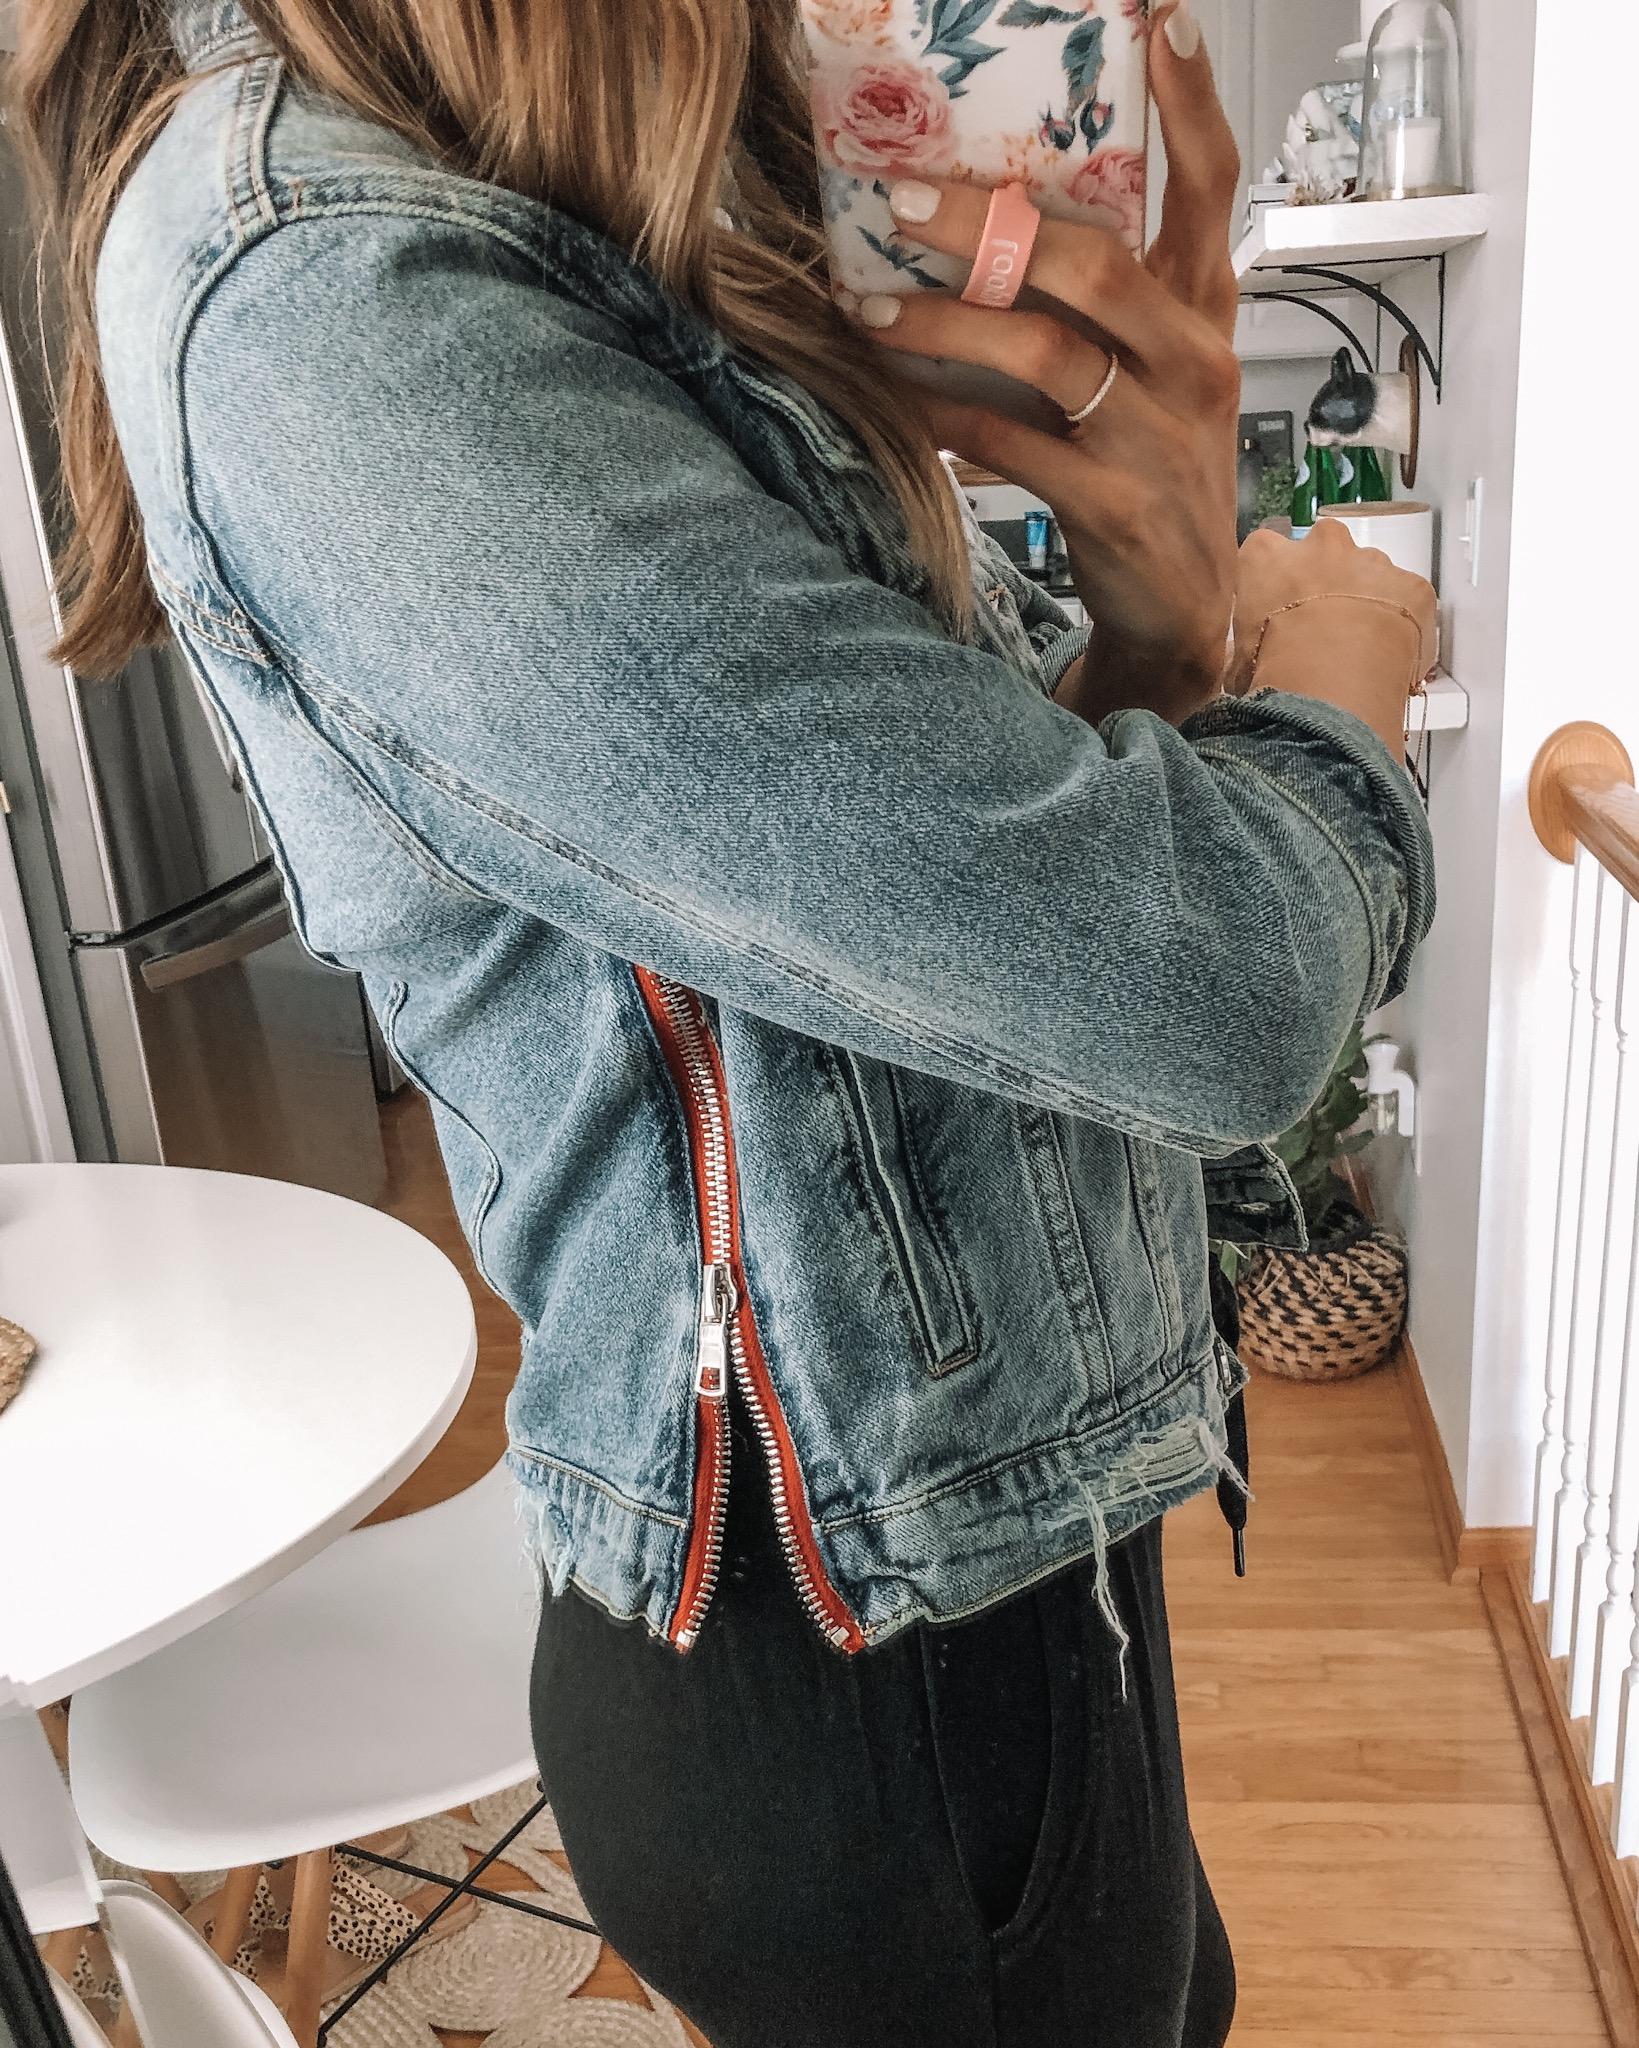 evereve Mother's Day sale 2019, blanknyc red fury denim jacket